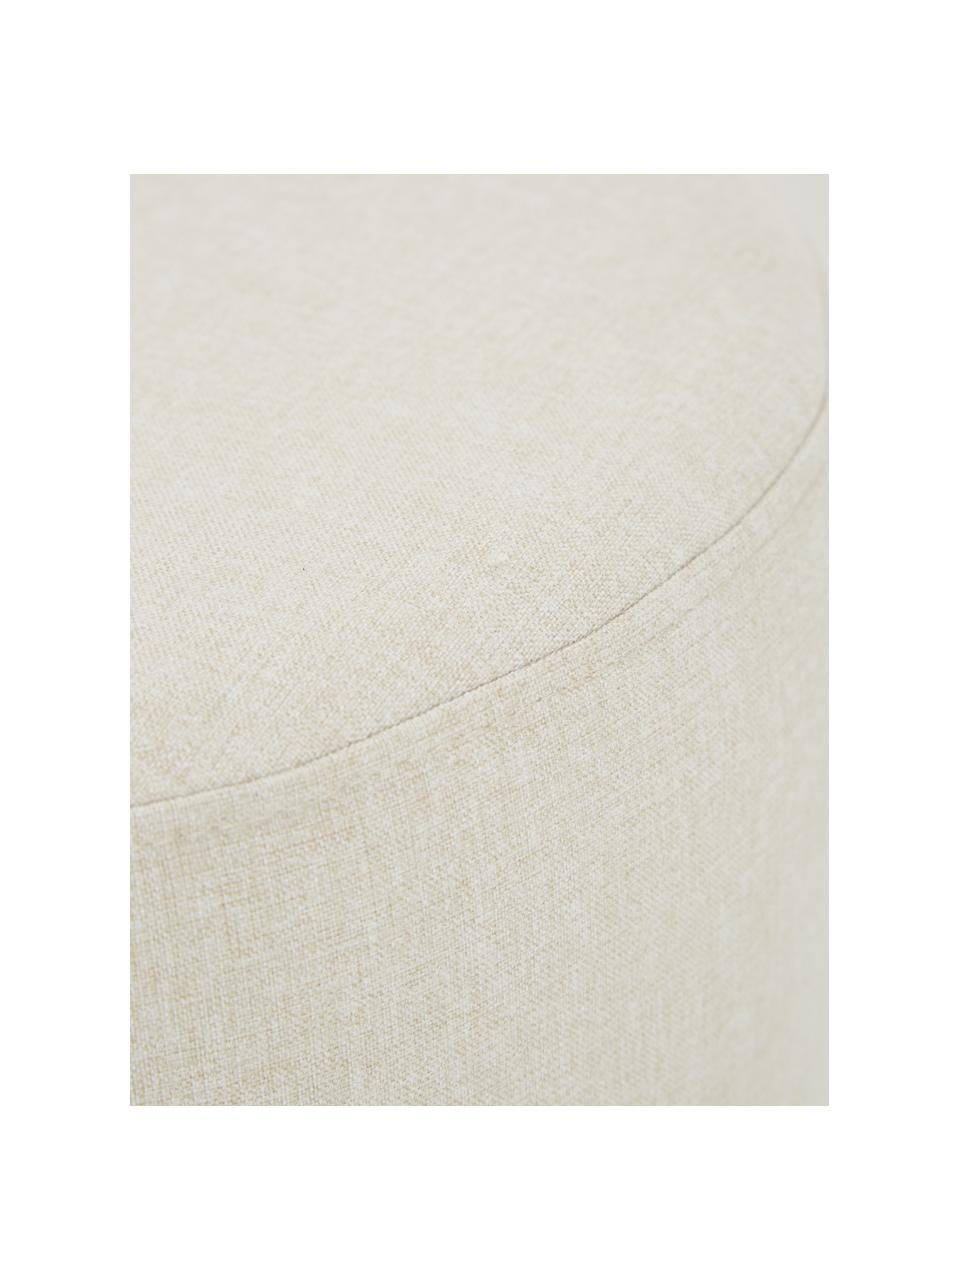 Hocker Mara mit Wiener Geflecht, Bezug: Polyester 40.000 Scheuert, Rahmen: Sperrholz, Fuß: Massives Birkenholz, Ratt, Beige, Ø 37 x H 39 cm